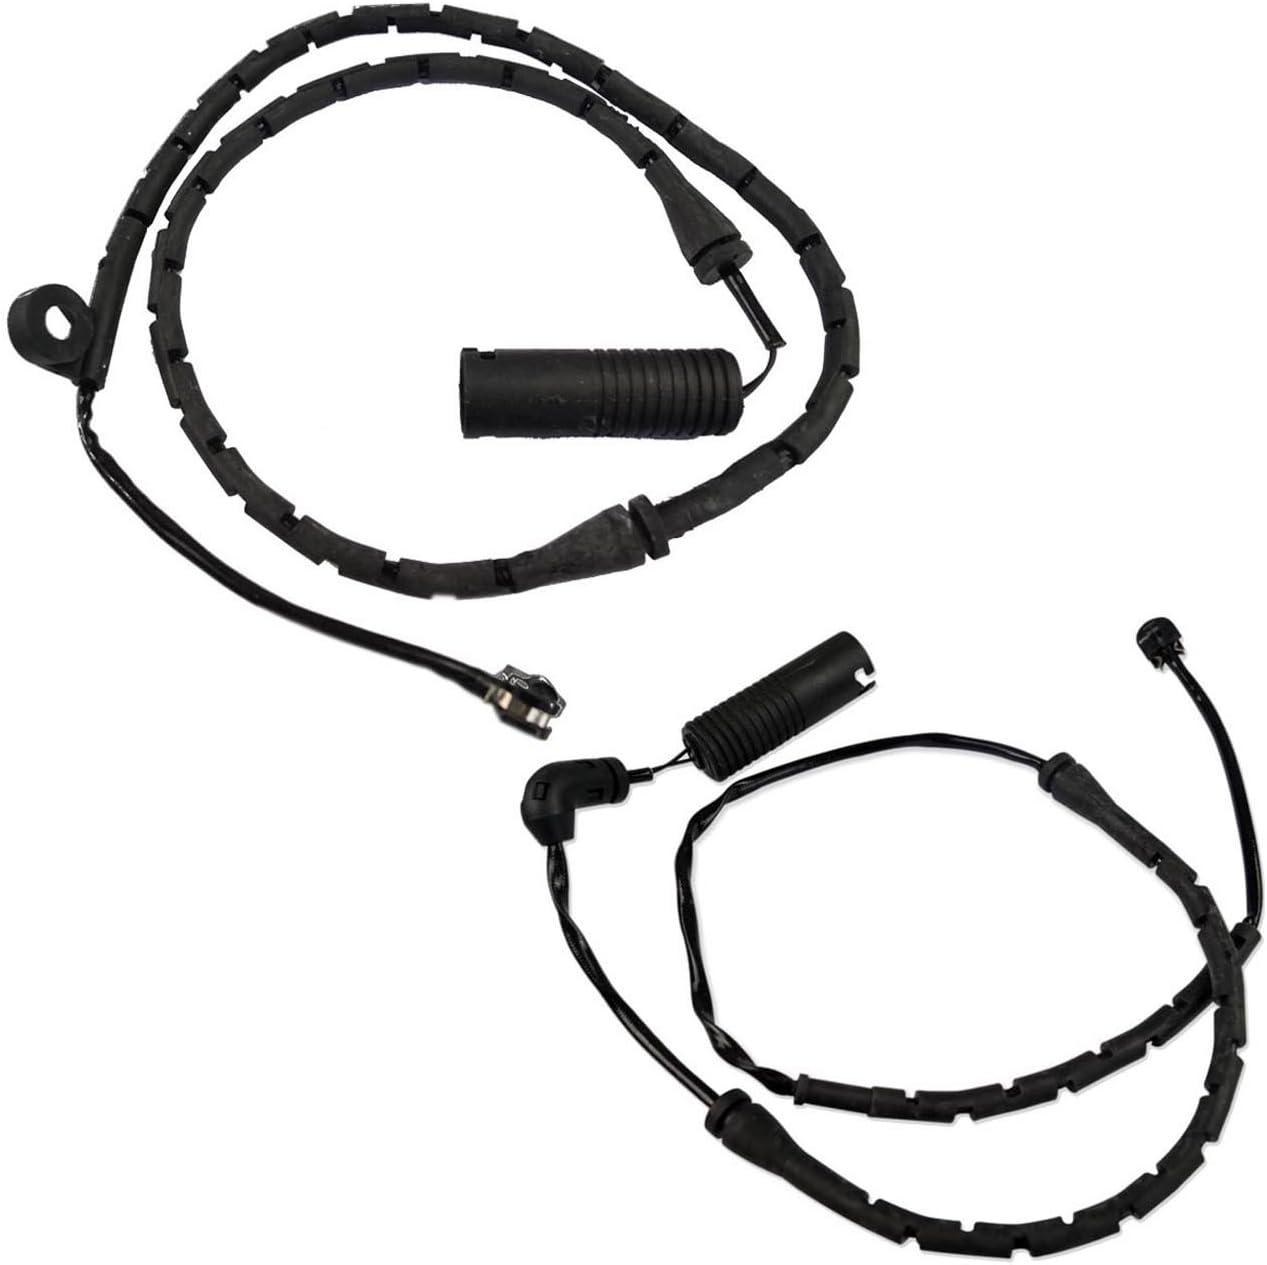 BMW Genuine Rear Brake Pad Wear Sensor E53 X5 34351165580